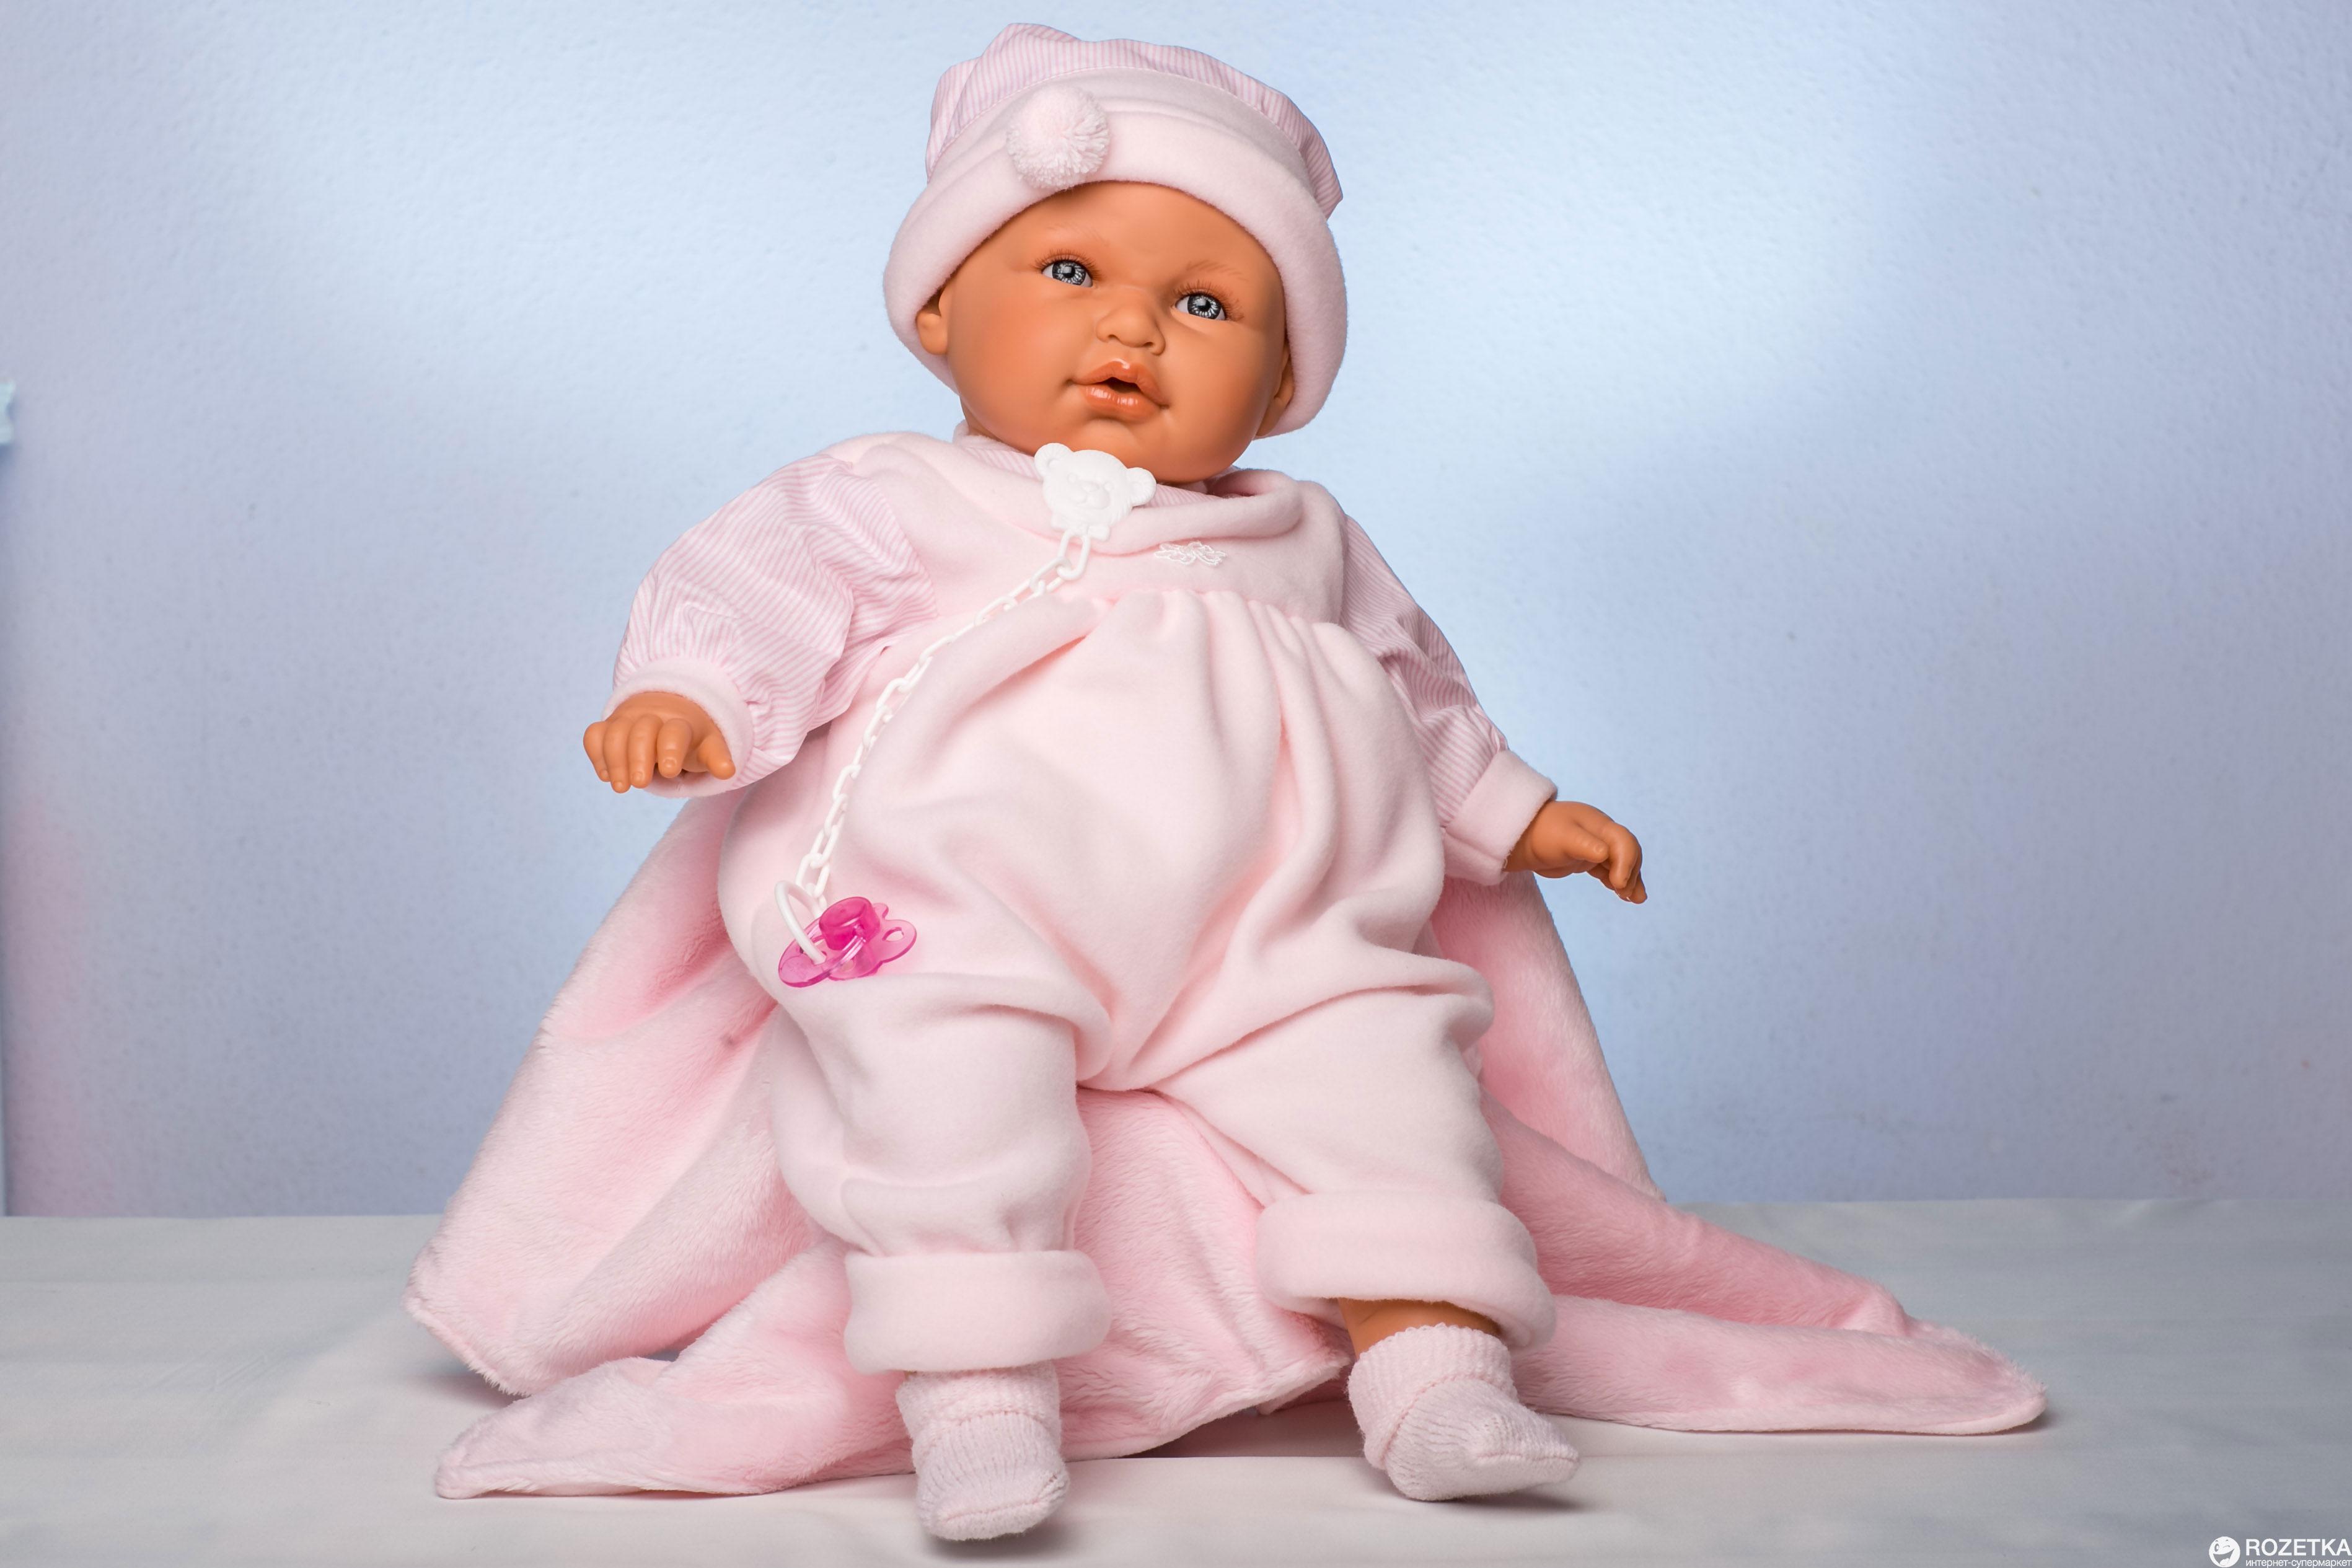 Кукла пупс  — необходимая игрушка каждому малышу